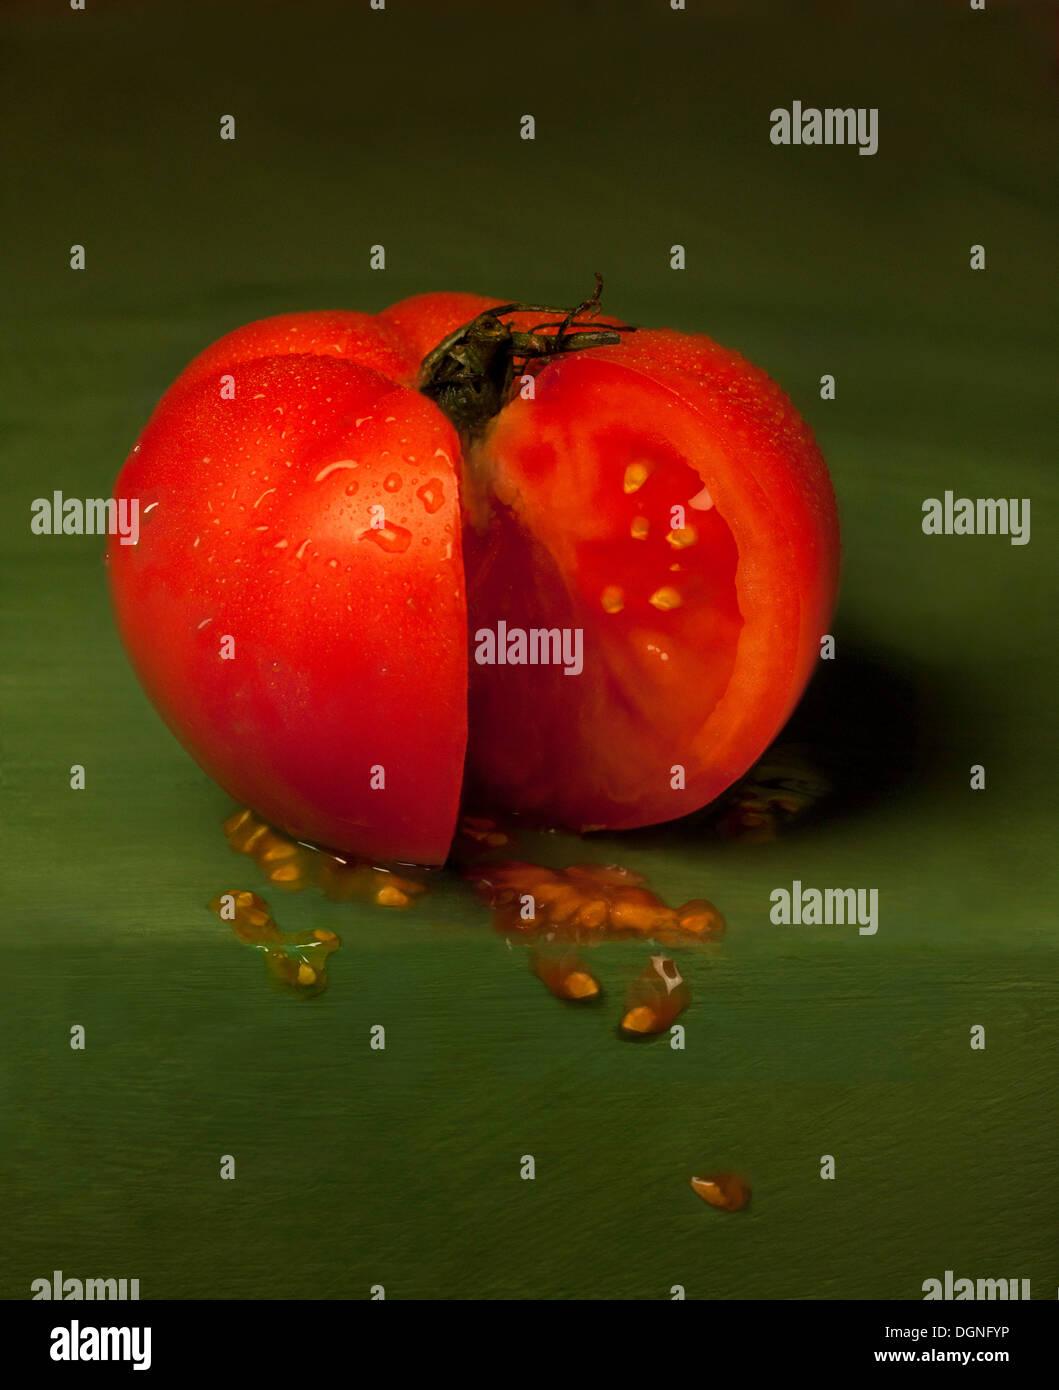 Sliced tomato on green backdrop - Stock Image